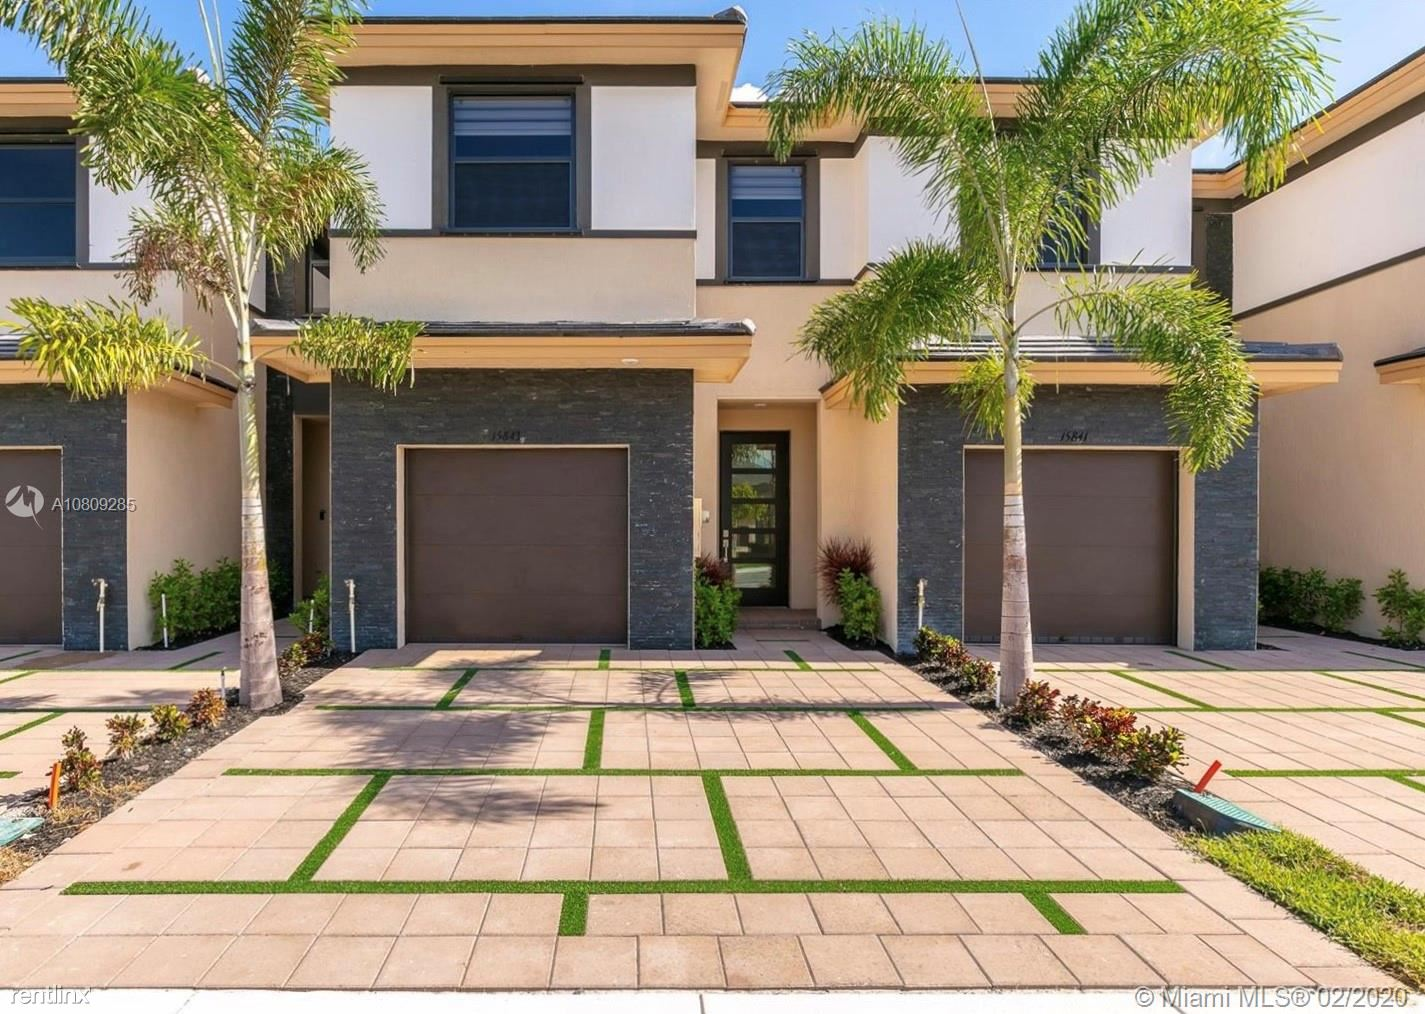 15843 NW 90th Ct, Miami Lakes, FL - $2,650